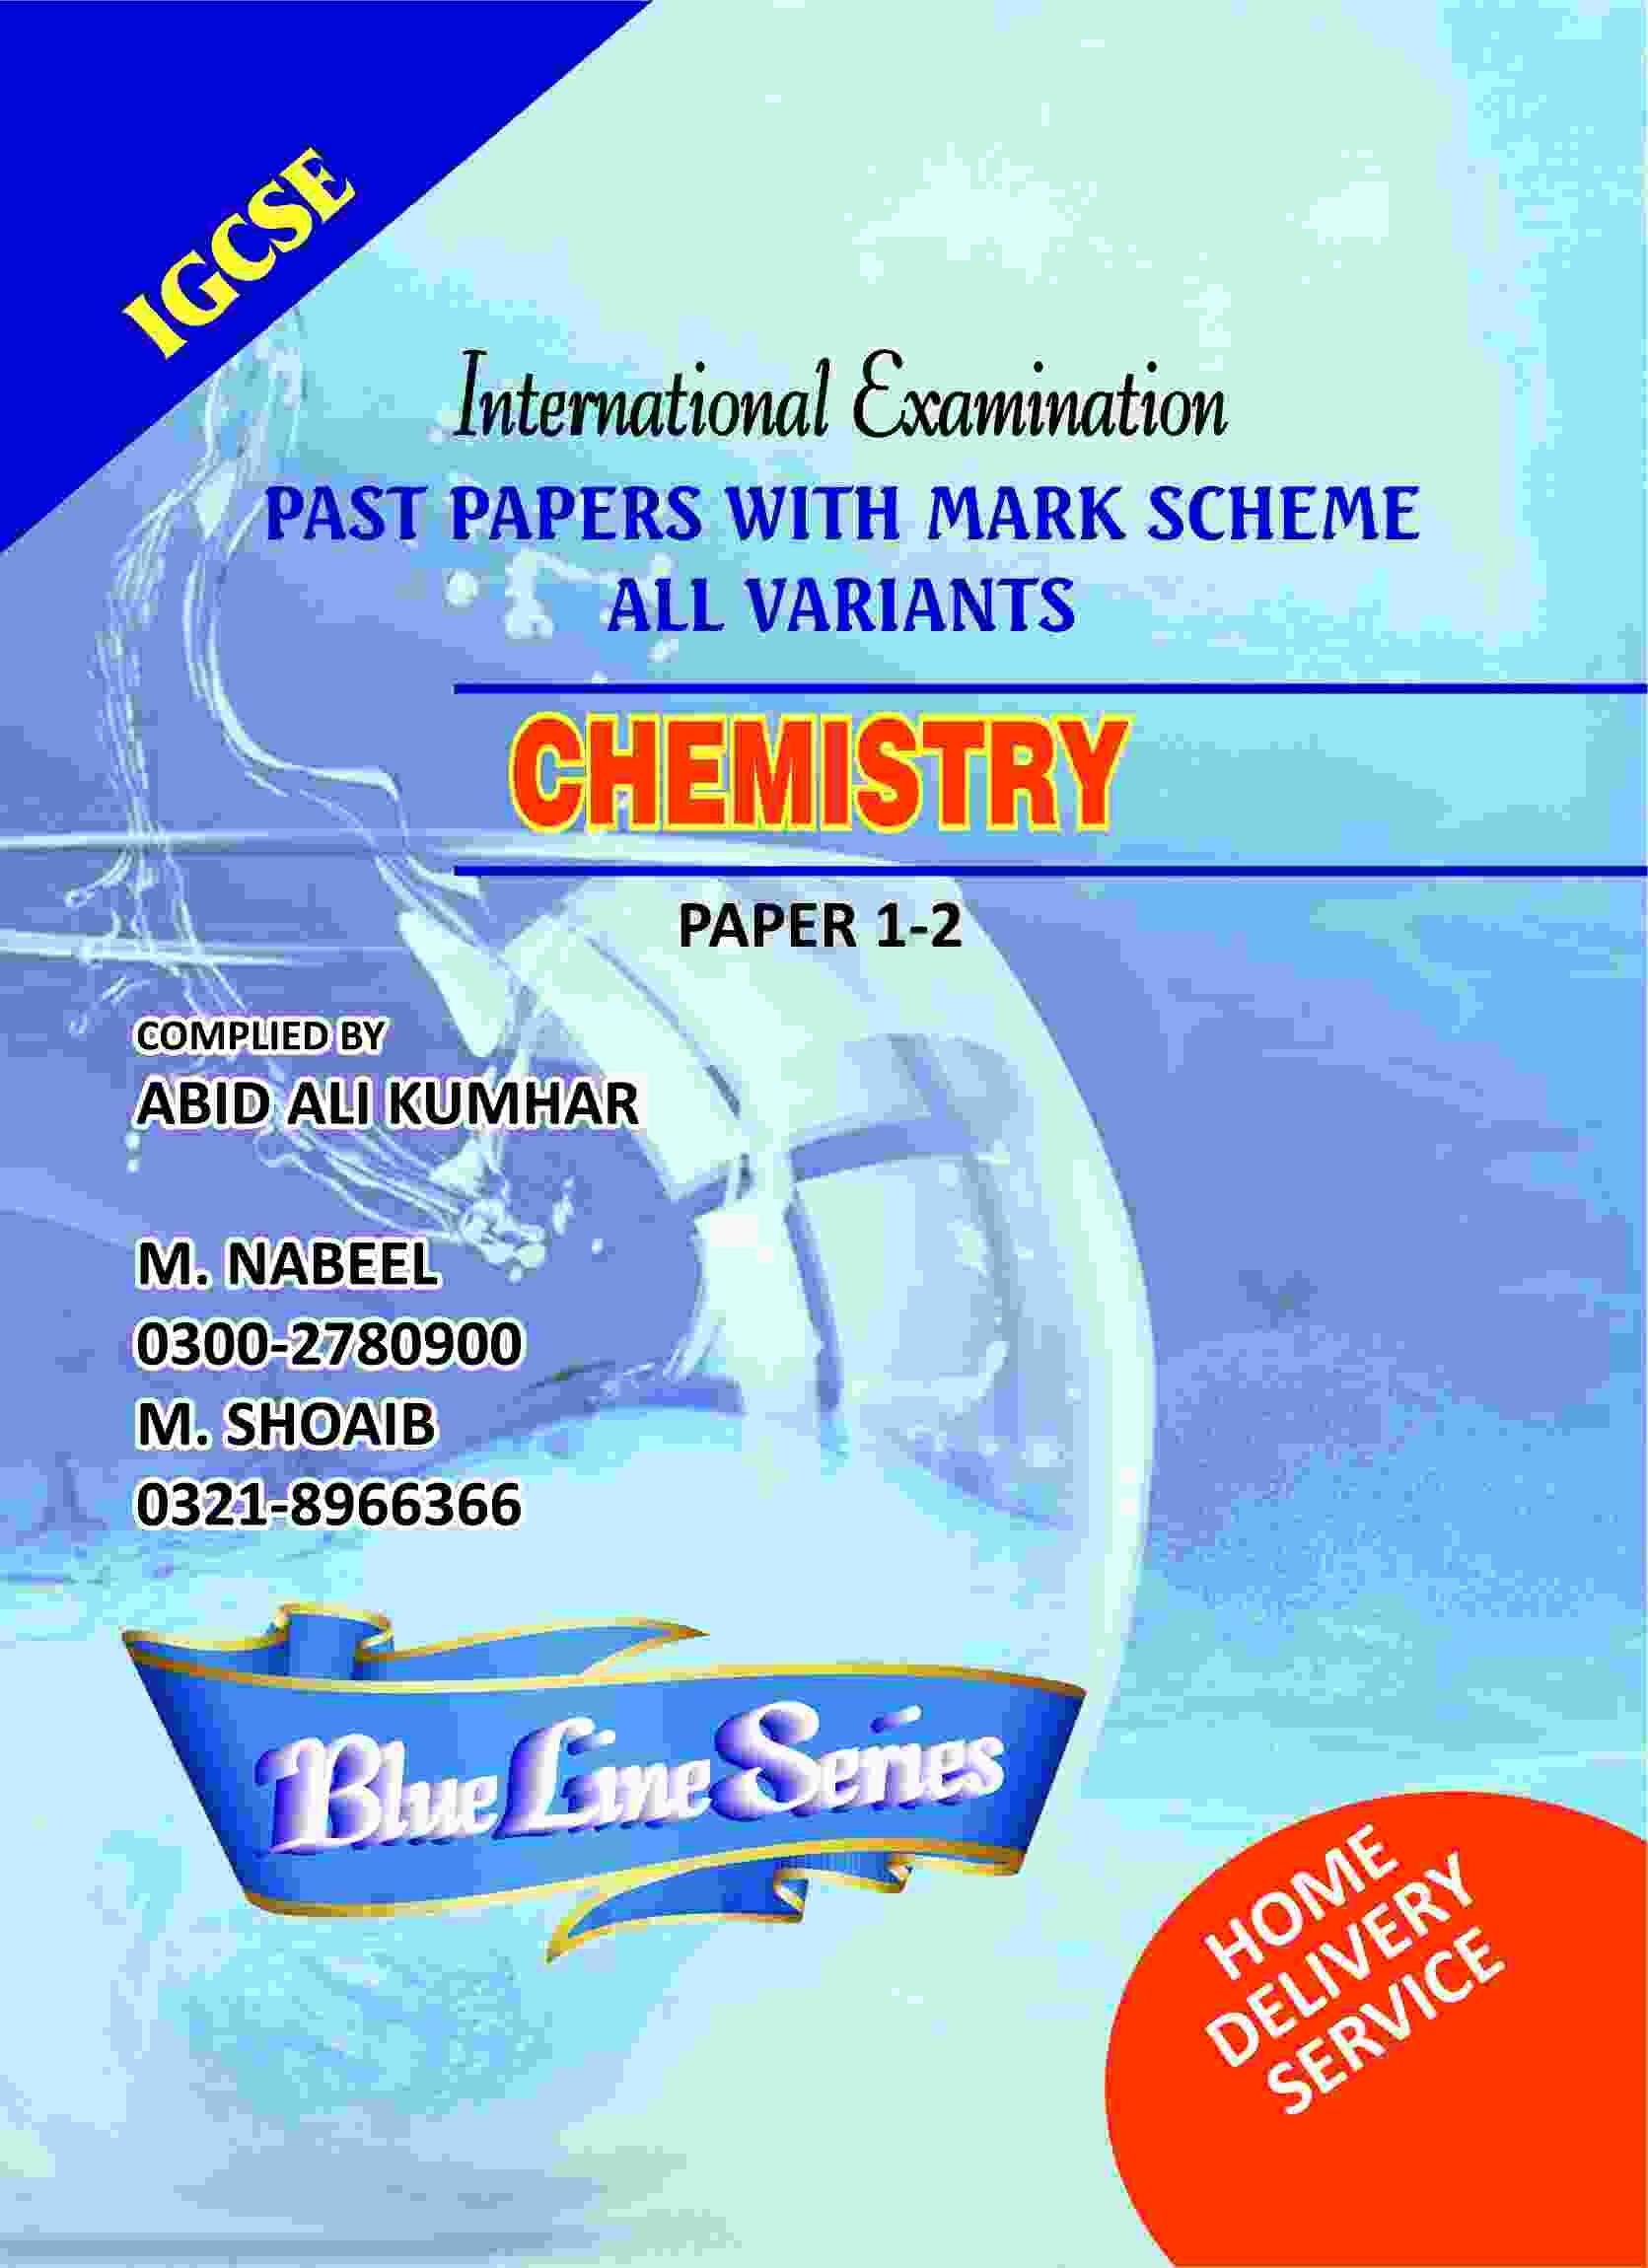 Igcse chemistry paper1-2